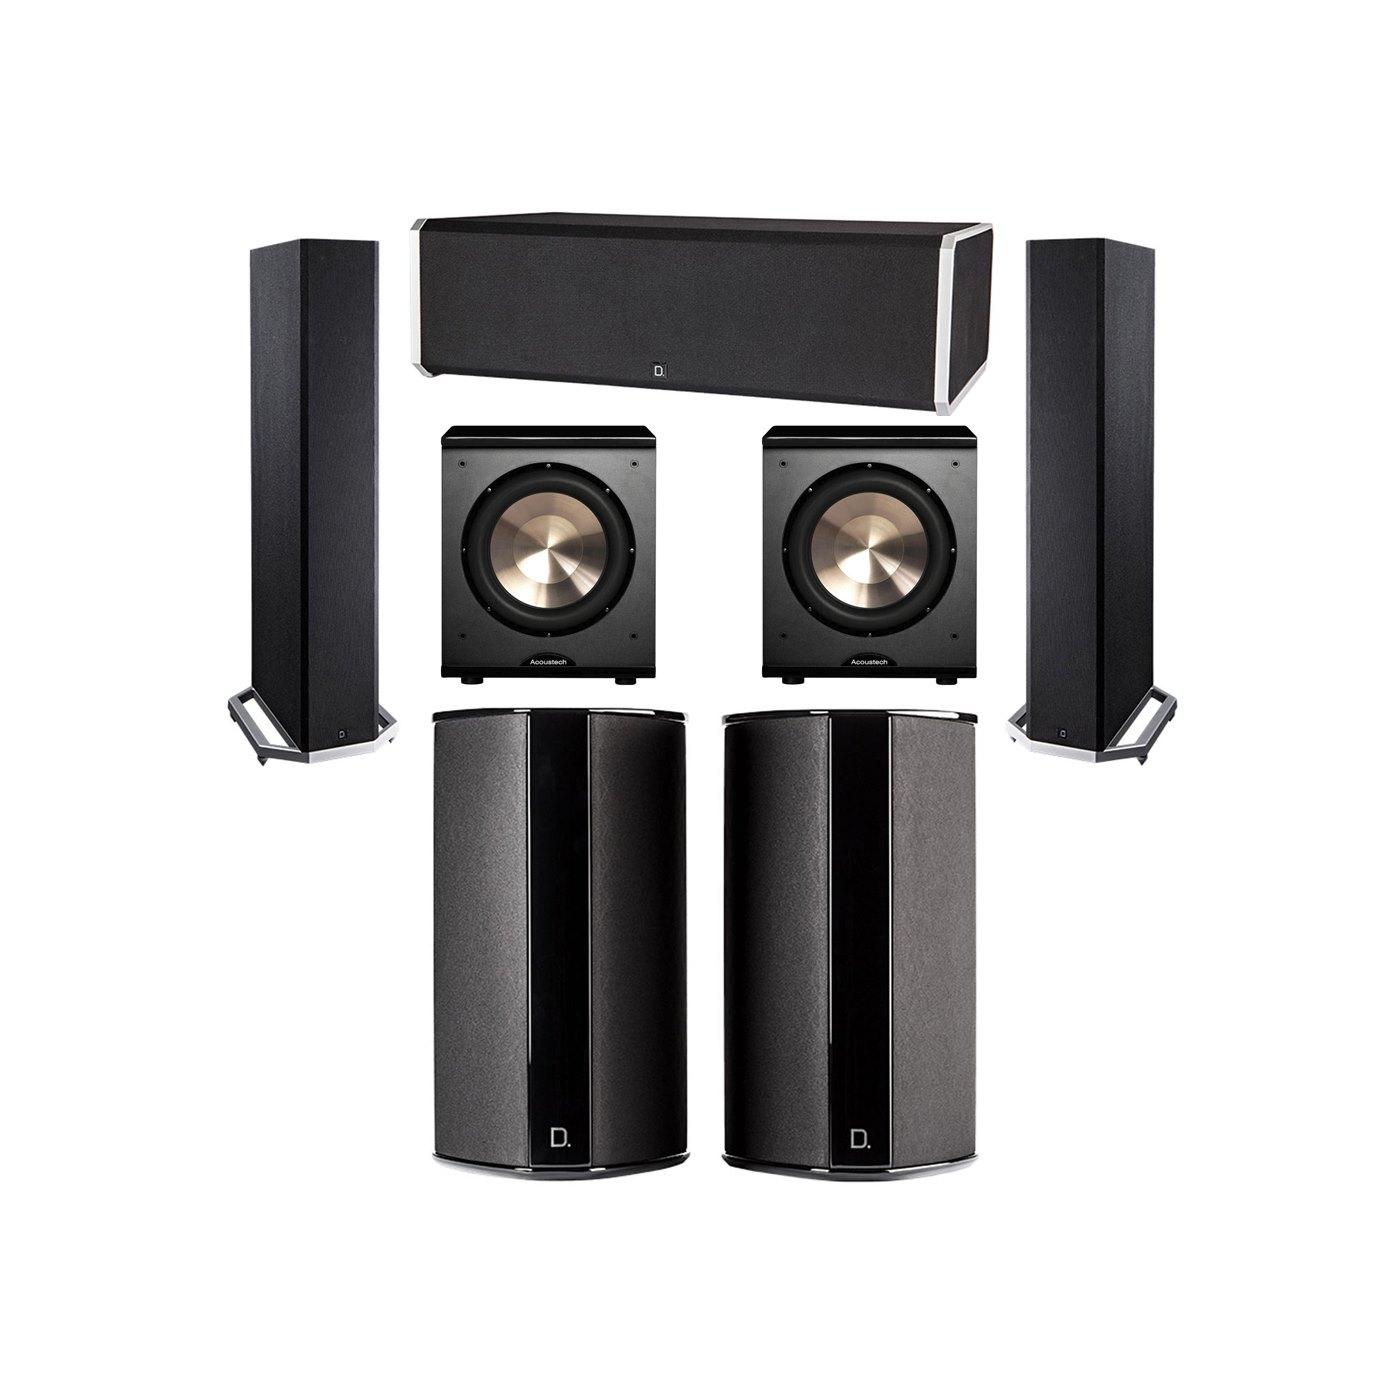 Definitive Technology 5.2 System with 2 BP9020 Tower Speakers, 1 CS9080 Center Channel Speaker, 2 SR9080 Surround Speaker, 2 BIC PL-200 Subwoofer